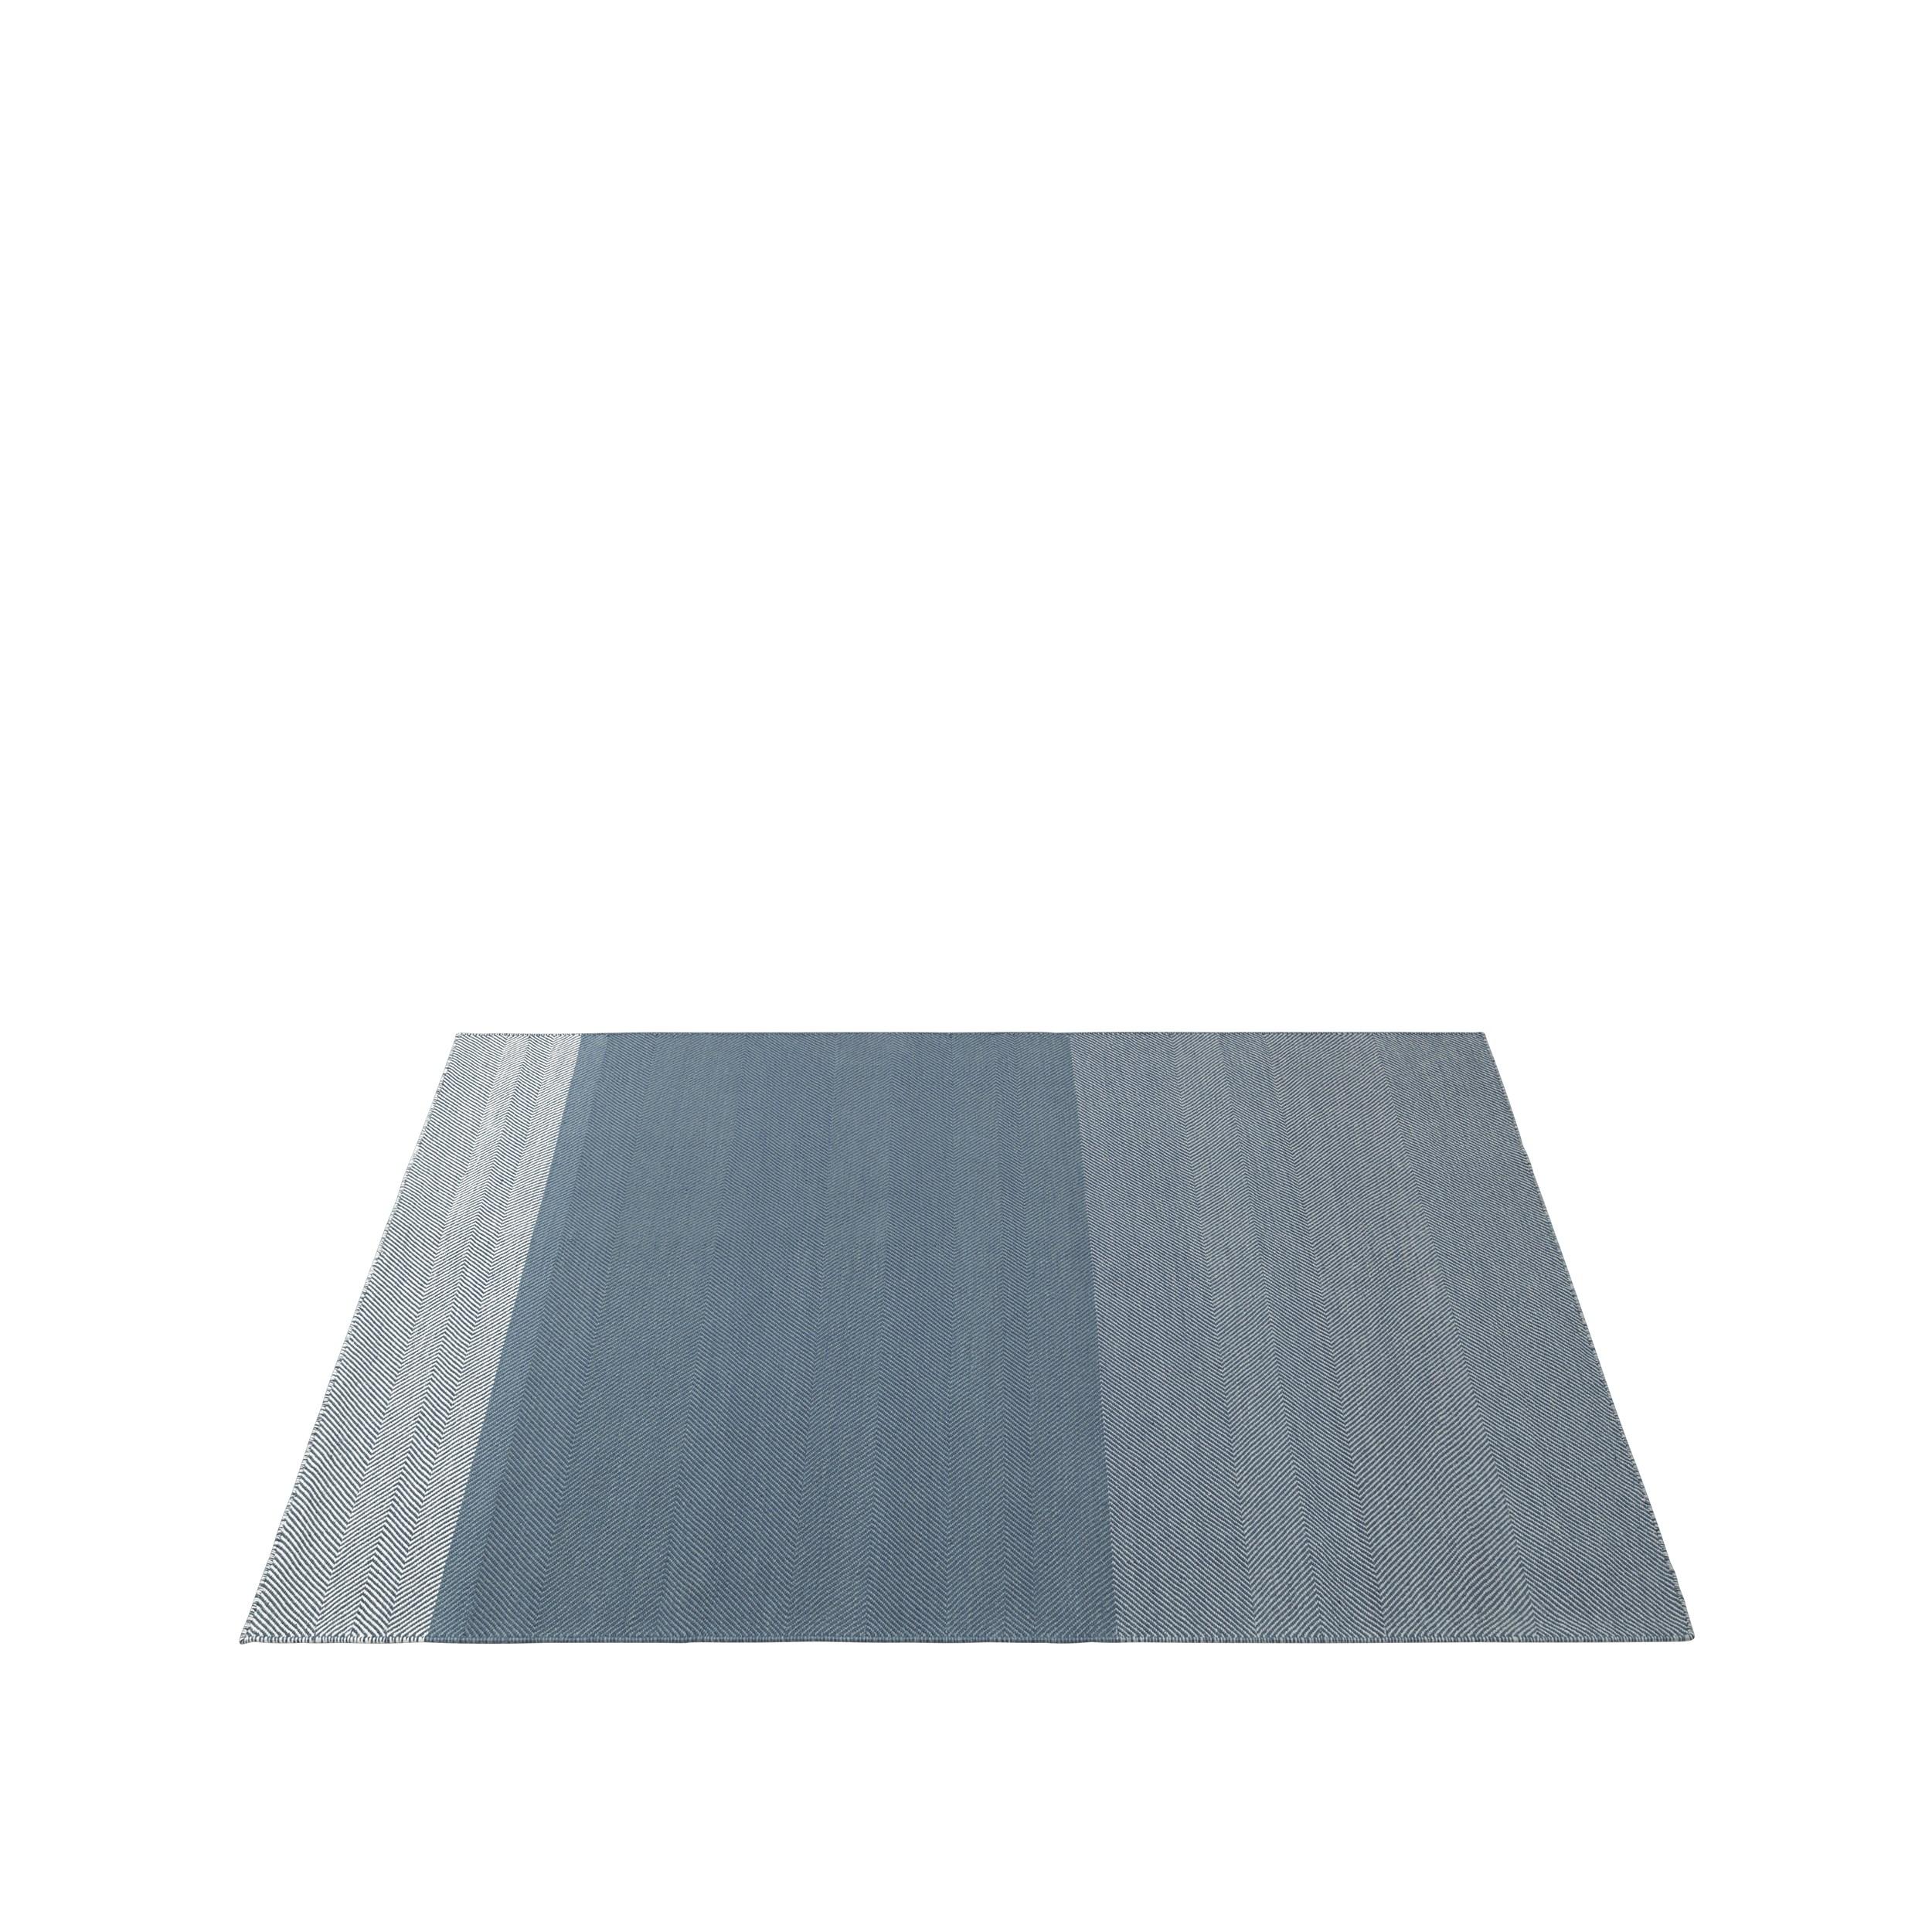 Varjo rug 170 x 240 blue